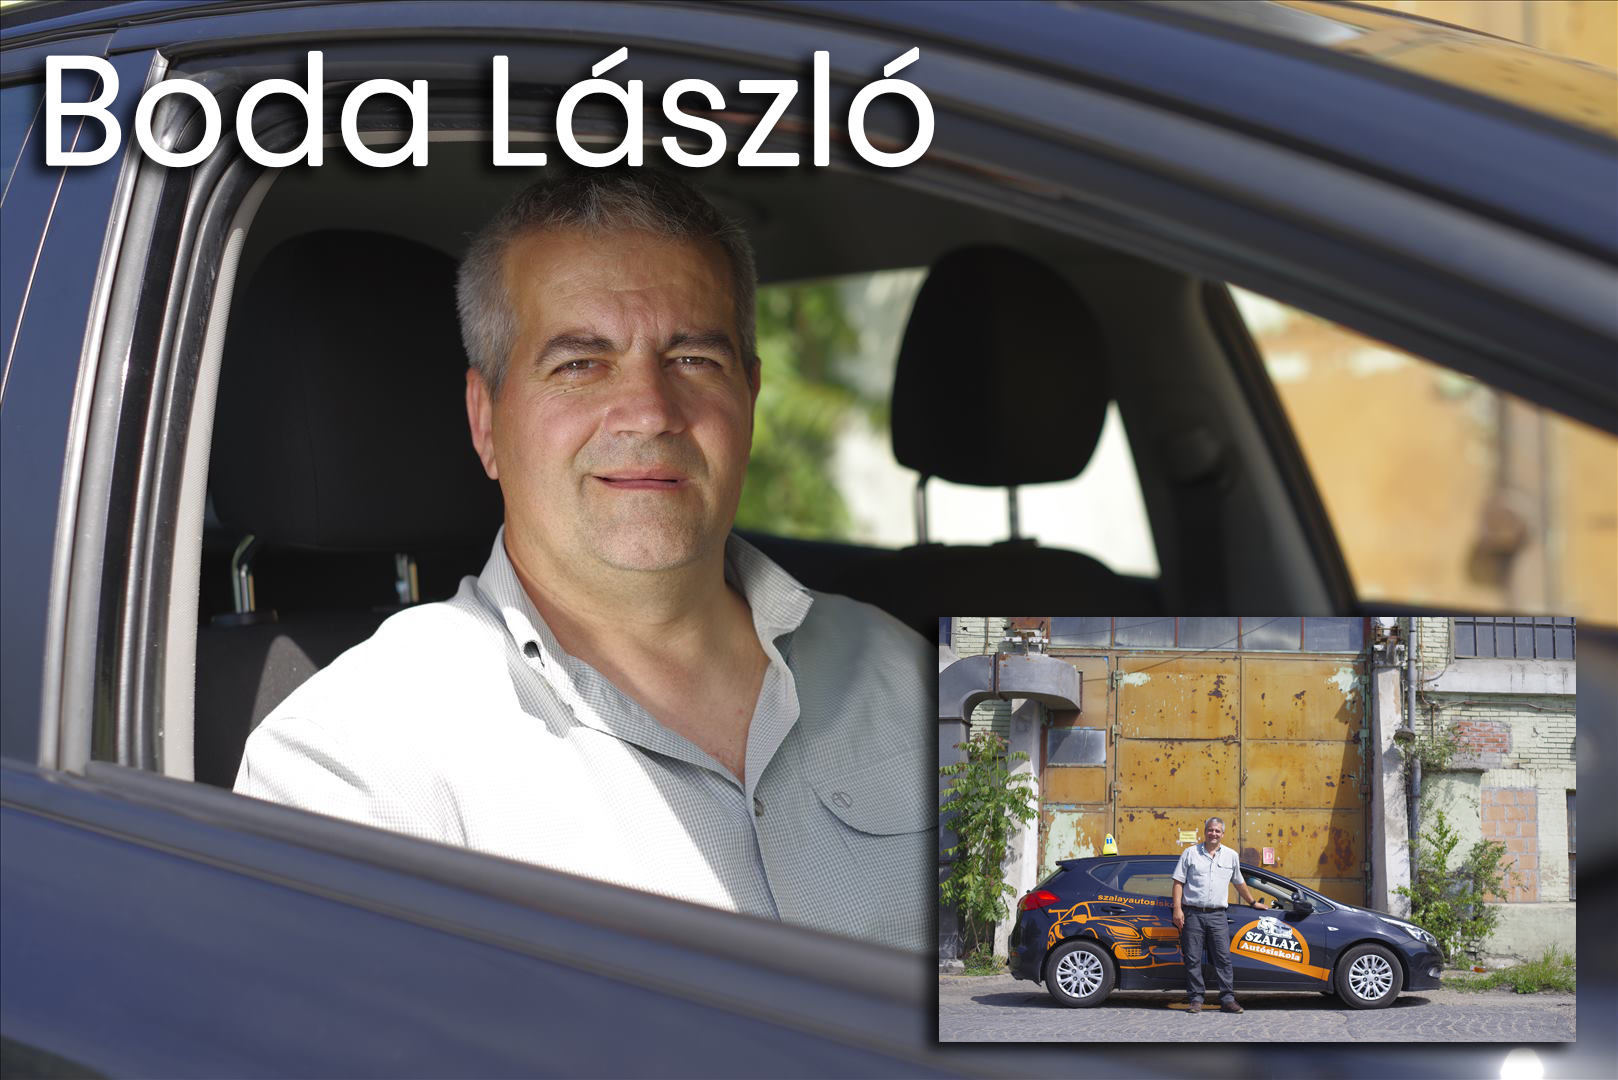 boda_laszlo_autosiskola